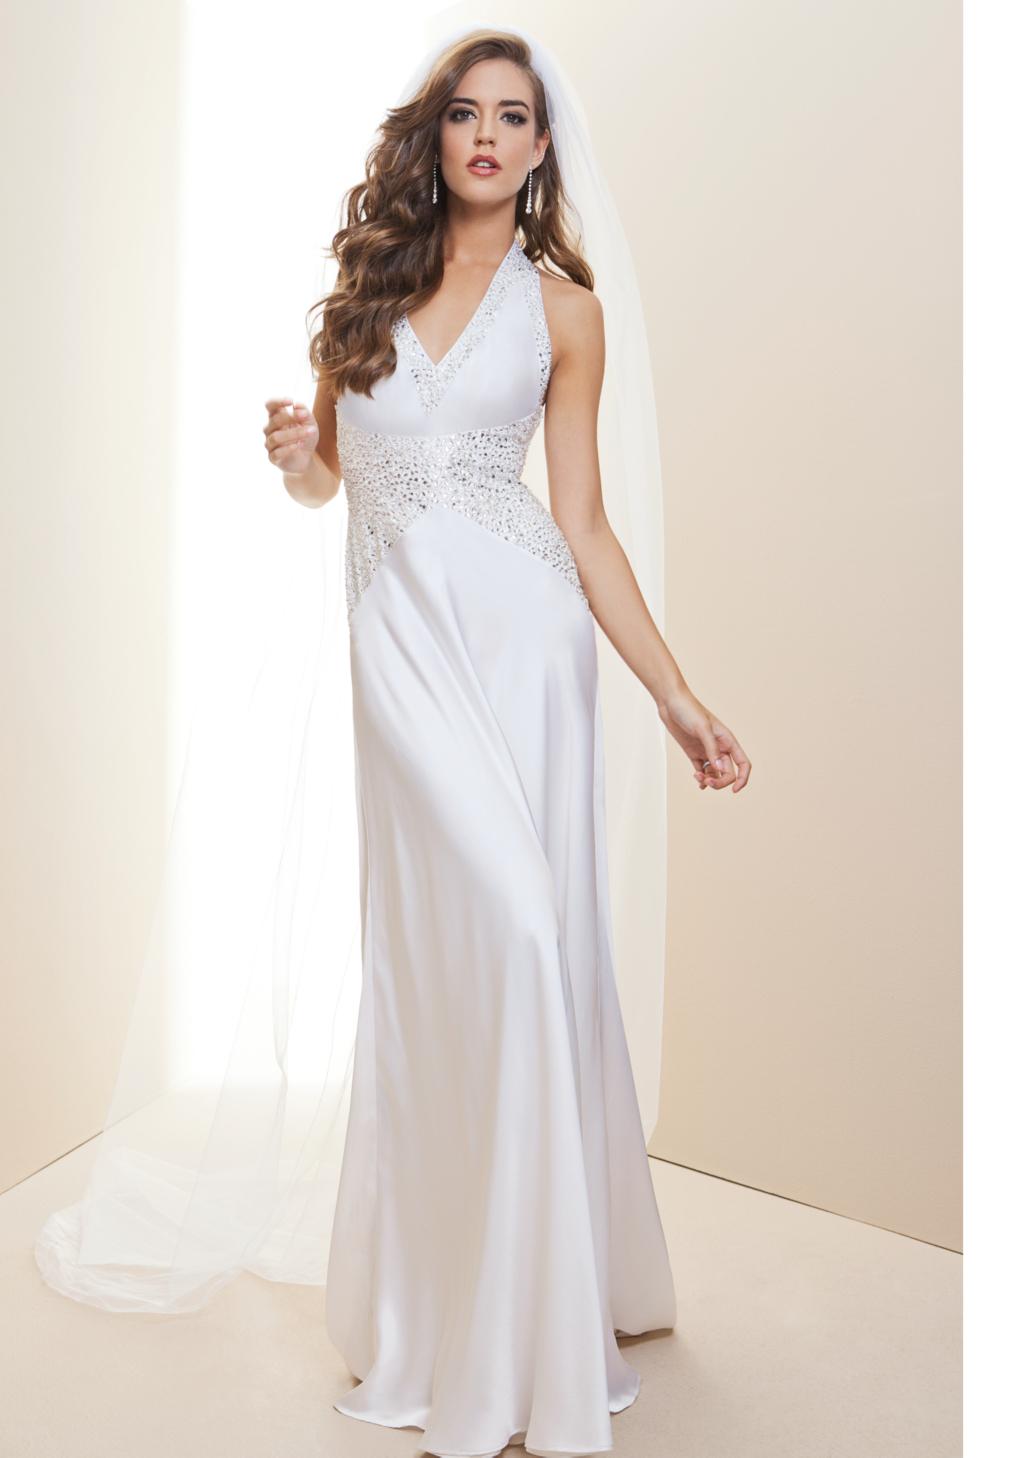 Lyst - Bebe Embellished Halter Charm Bridal Gown Rami Kashou in White